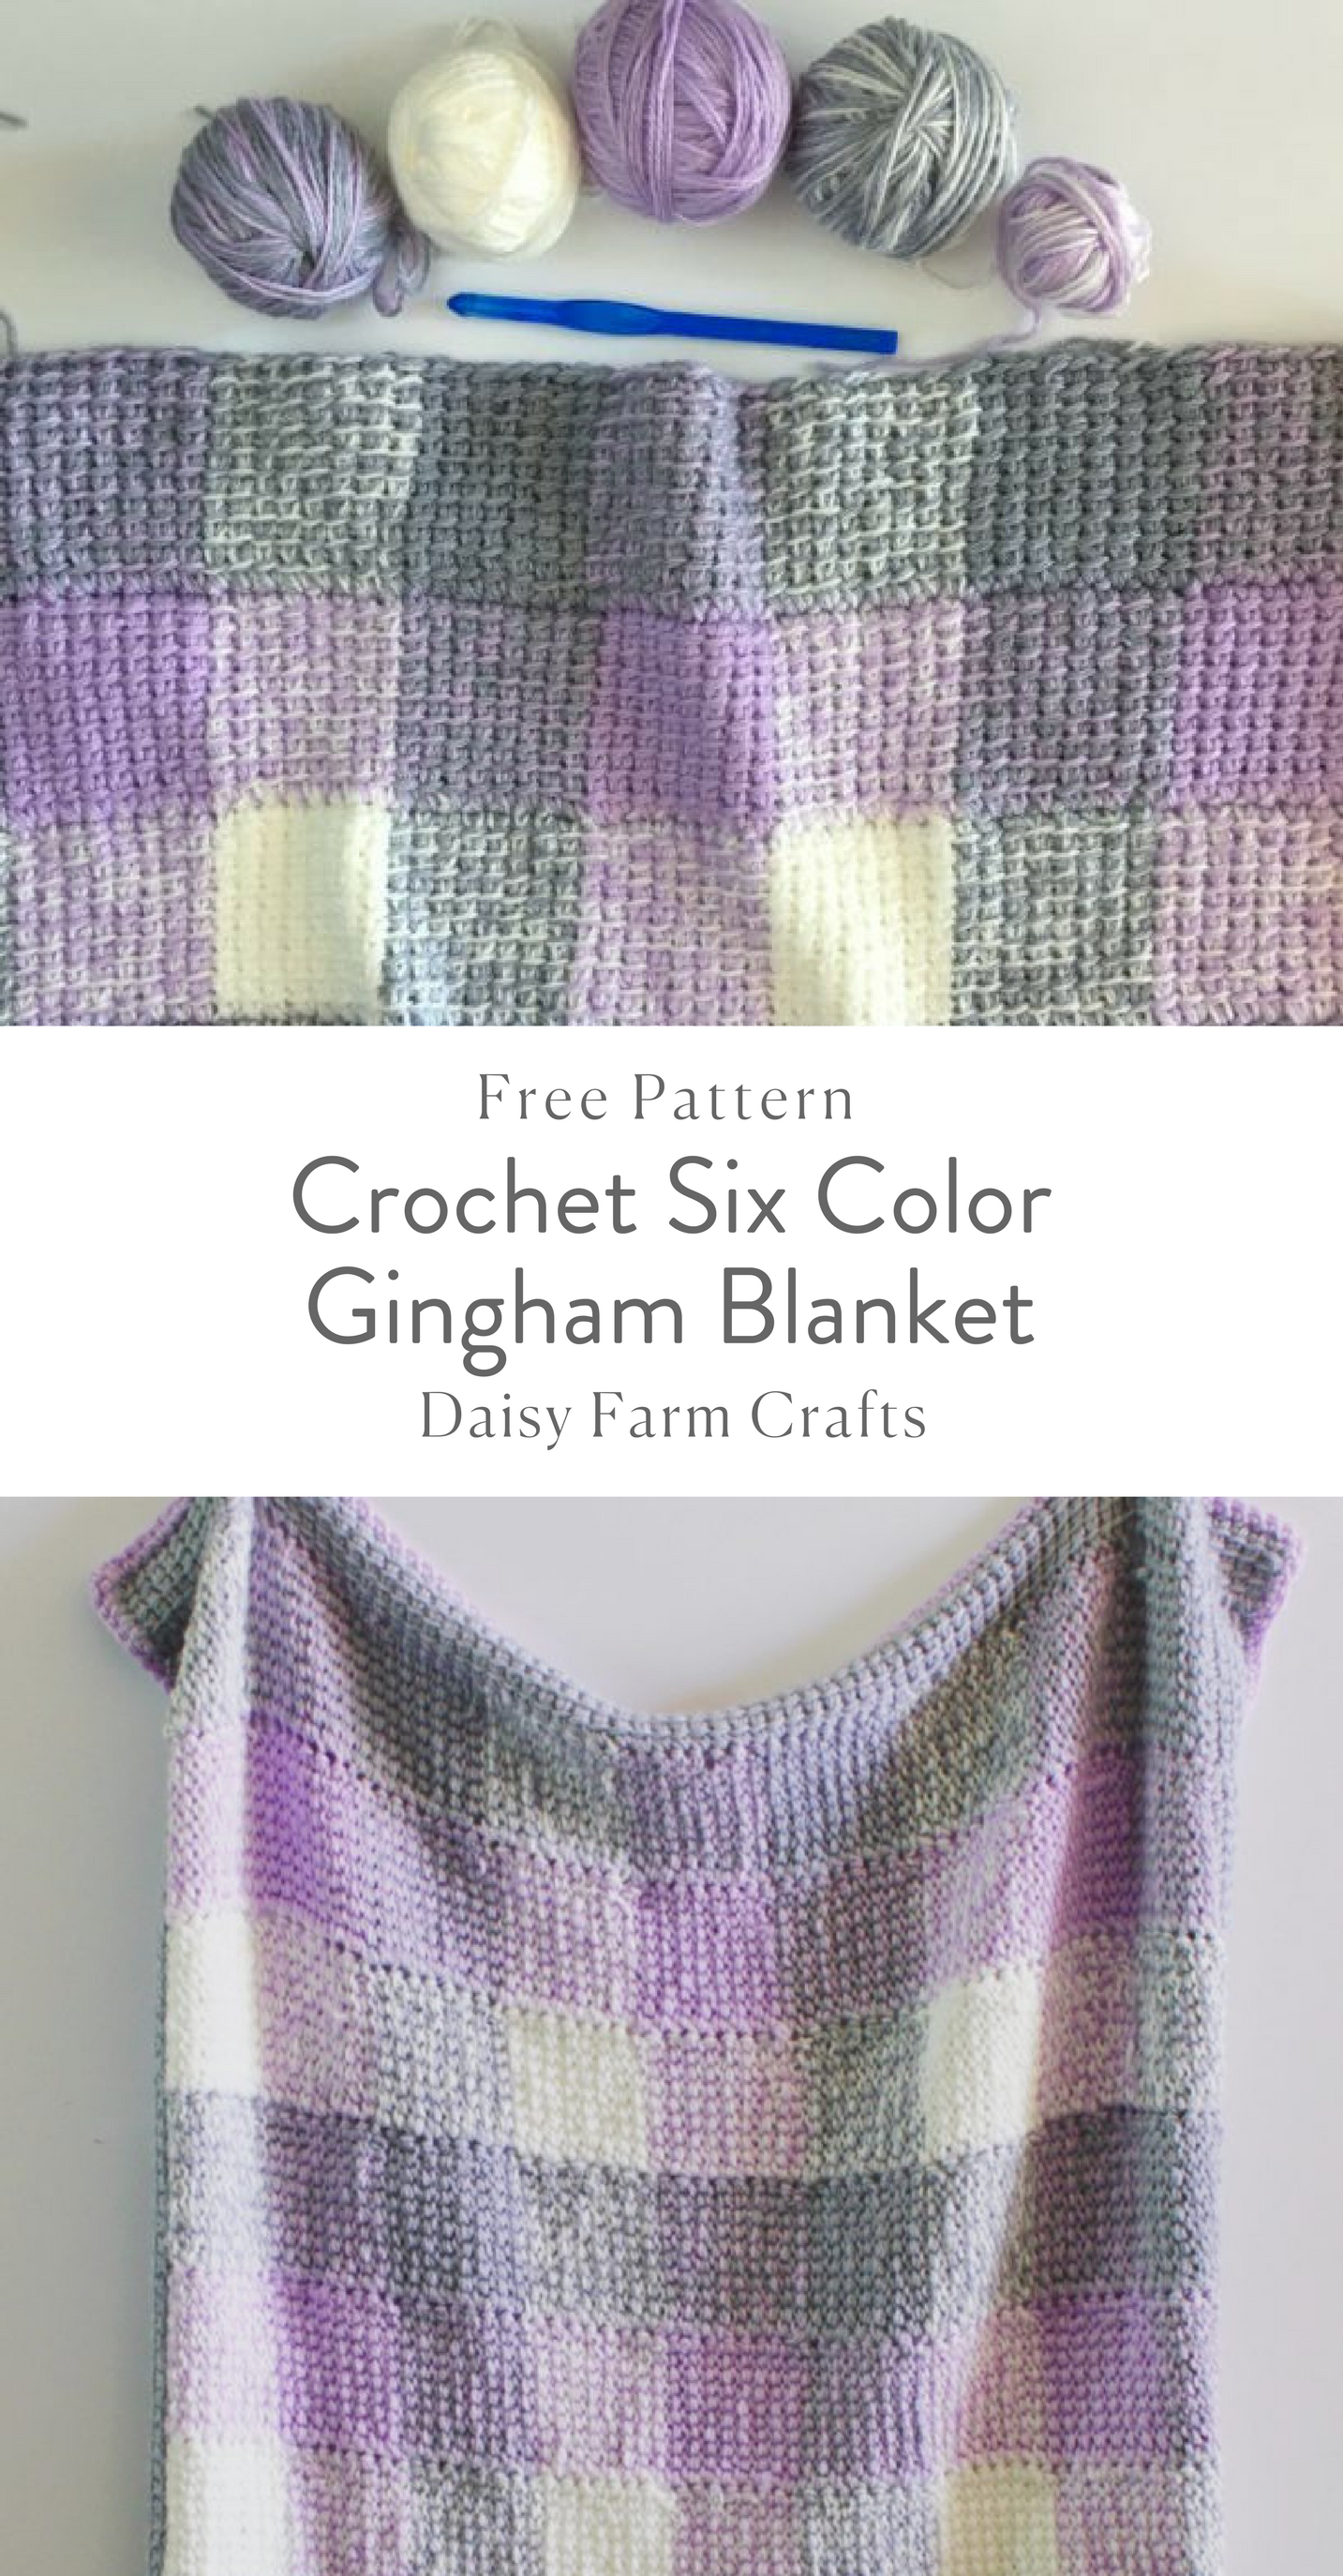 Free Pattern Crochet Six Color Gingham Blanket Crochet For Beginners Blanket Crochet Blanket Patterns Afghan Crochet Patterns